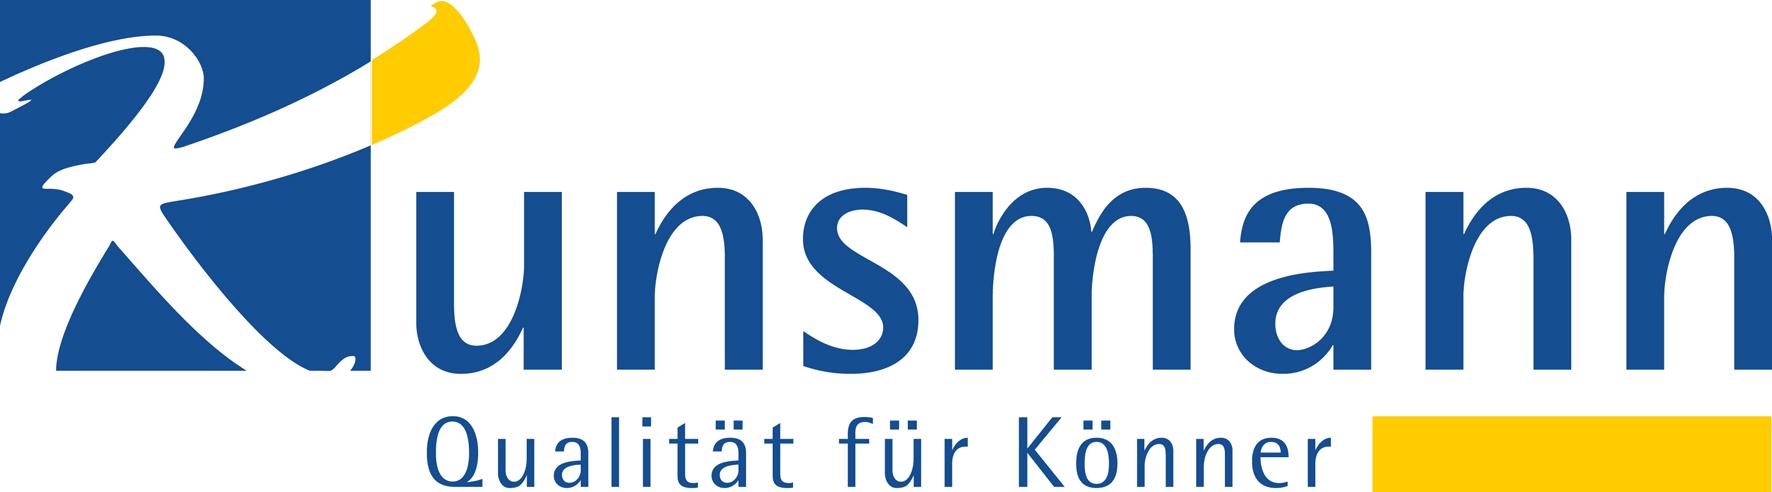 Kunsmann GmbH